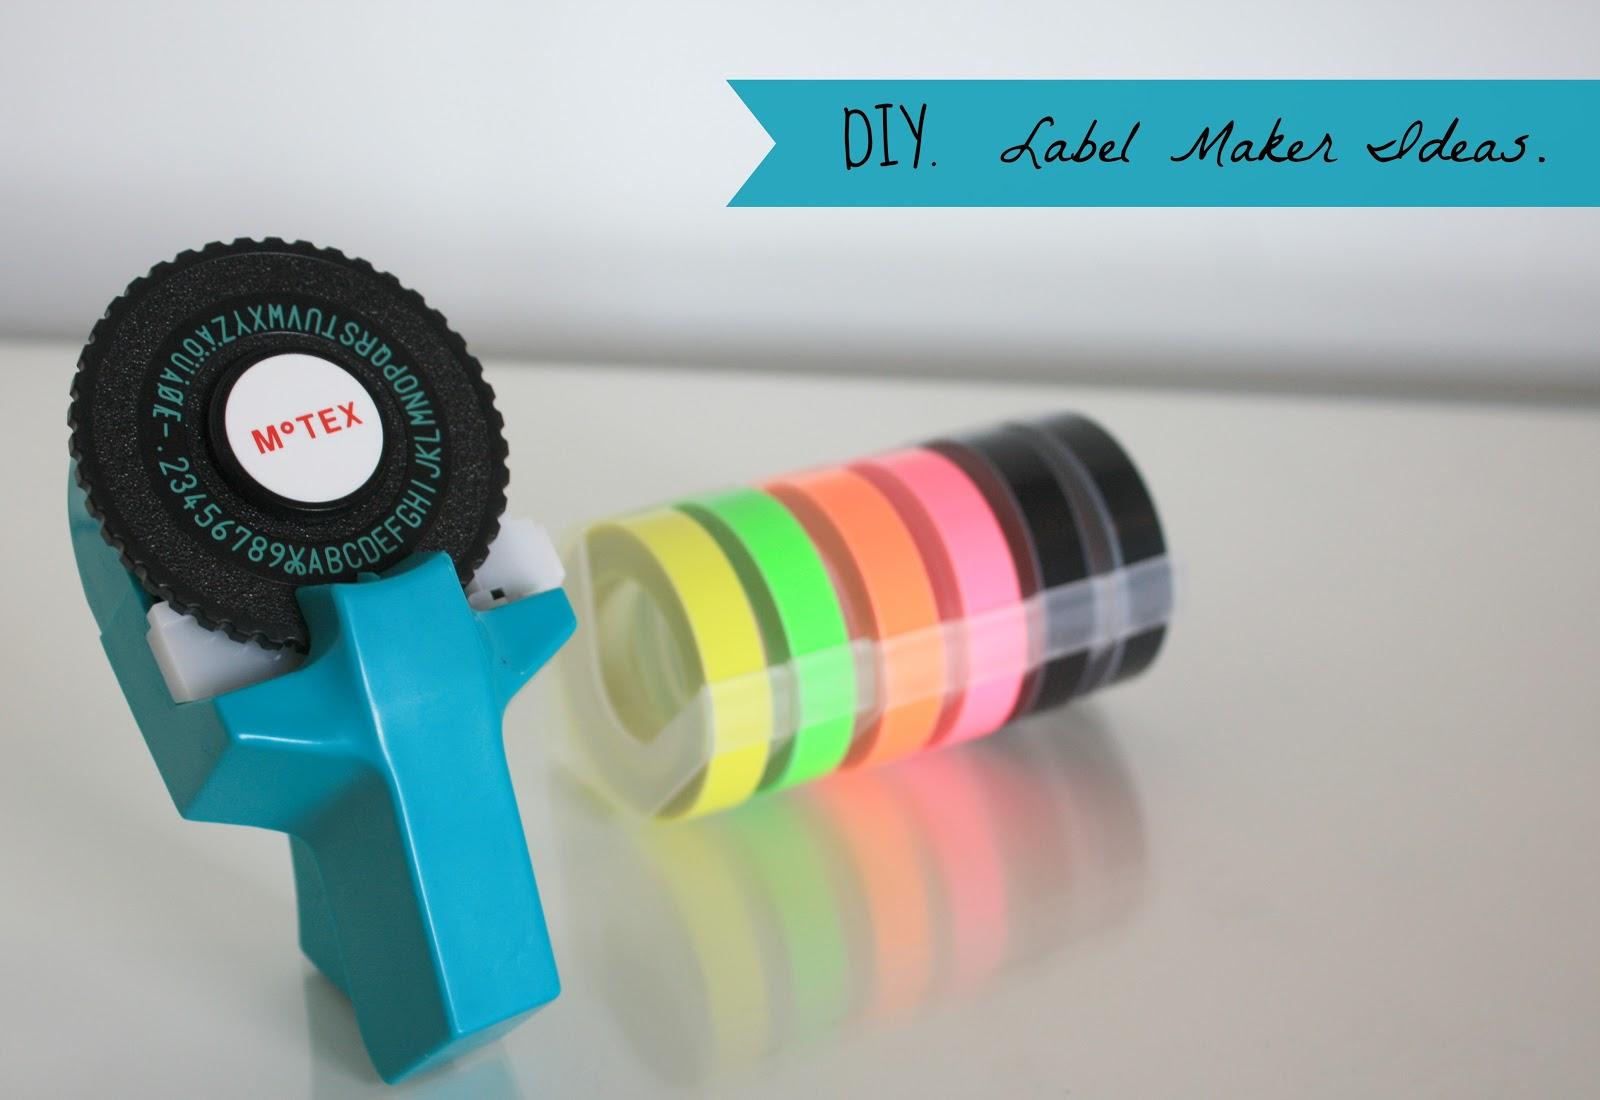 DIY: LABEL MAKER IDEAS.